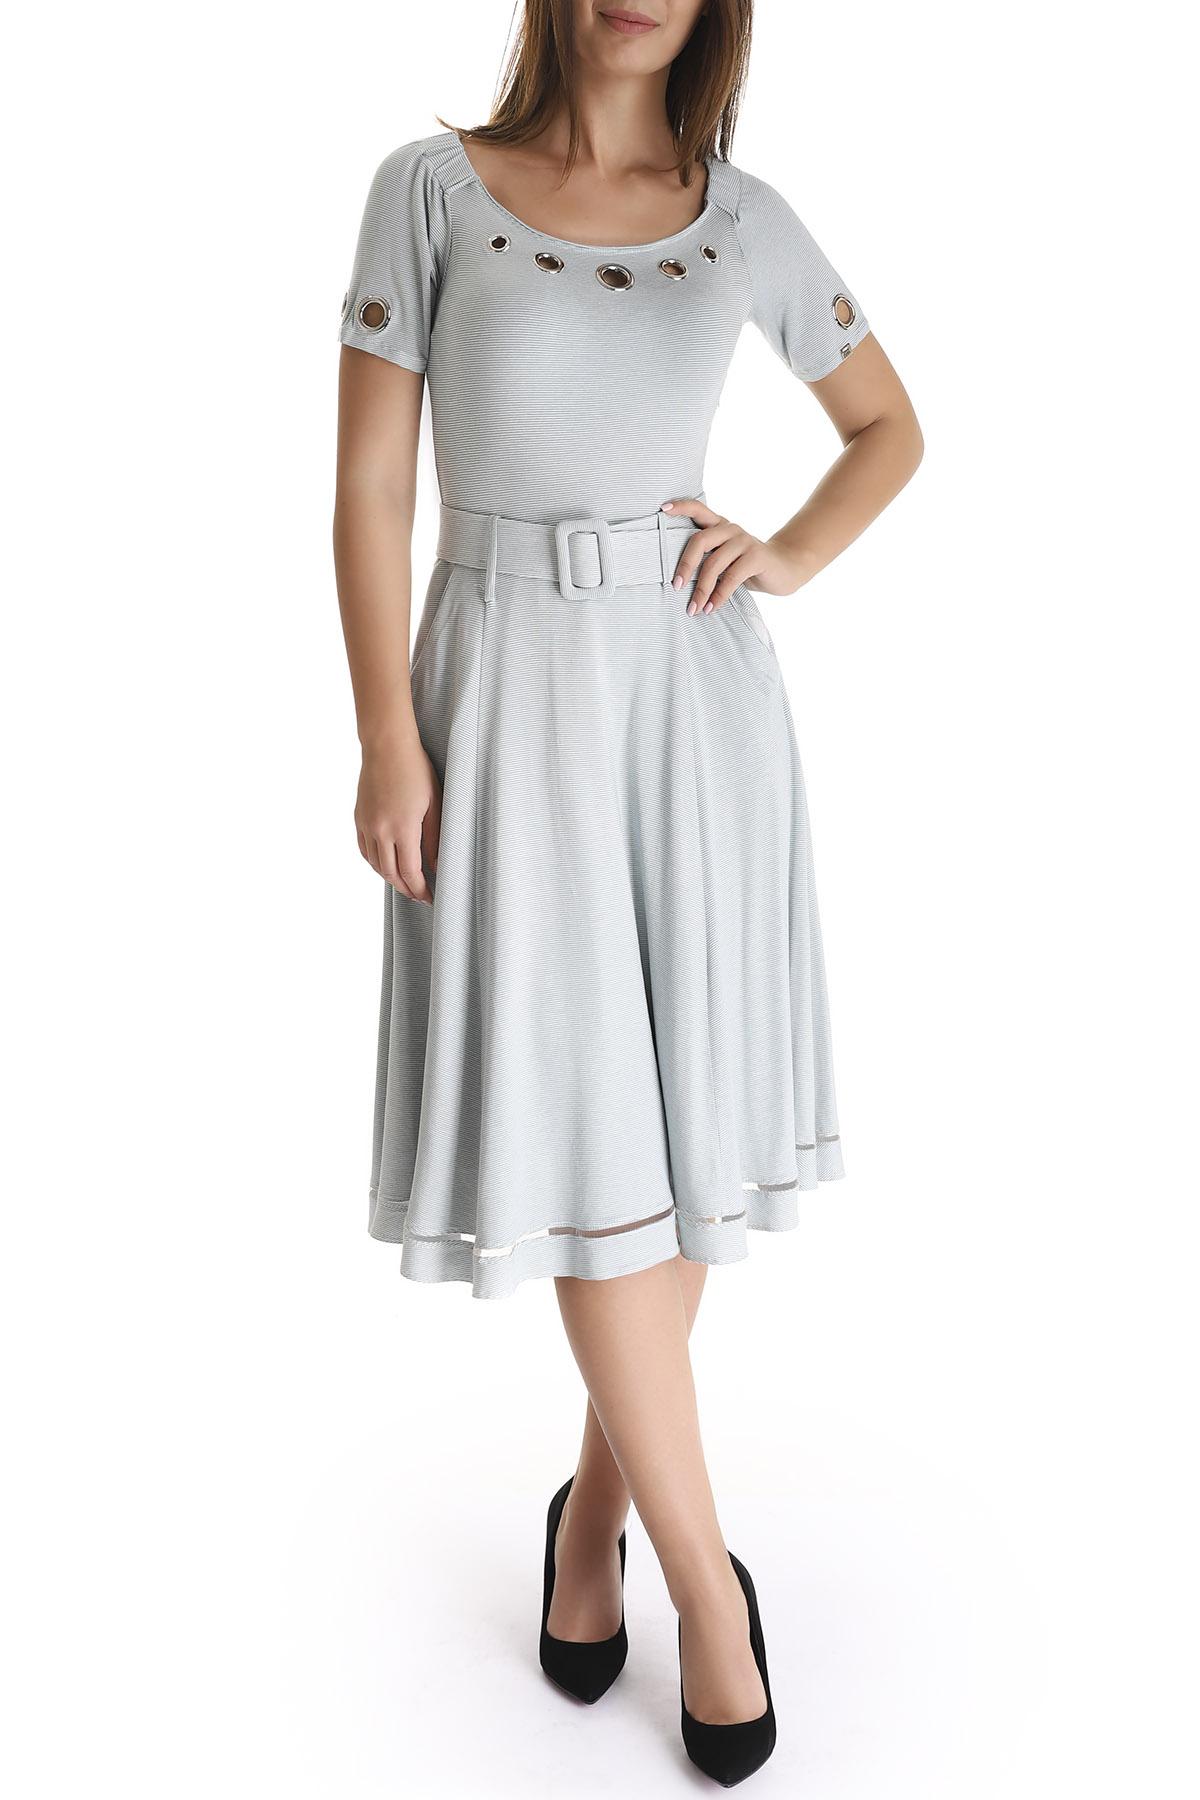 WIDE DRESS DOROTEA